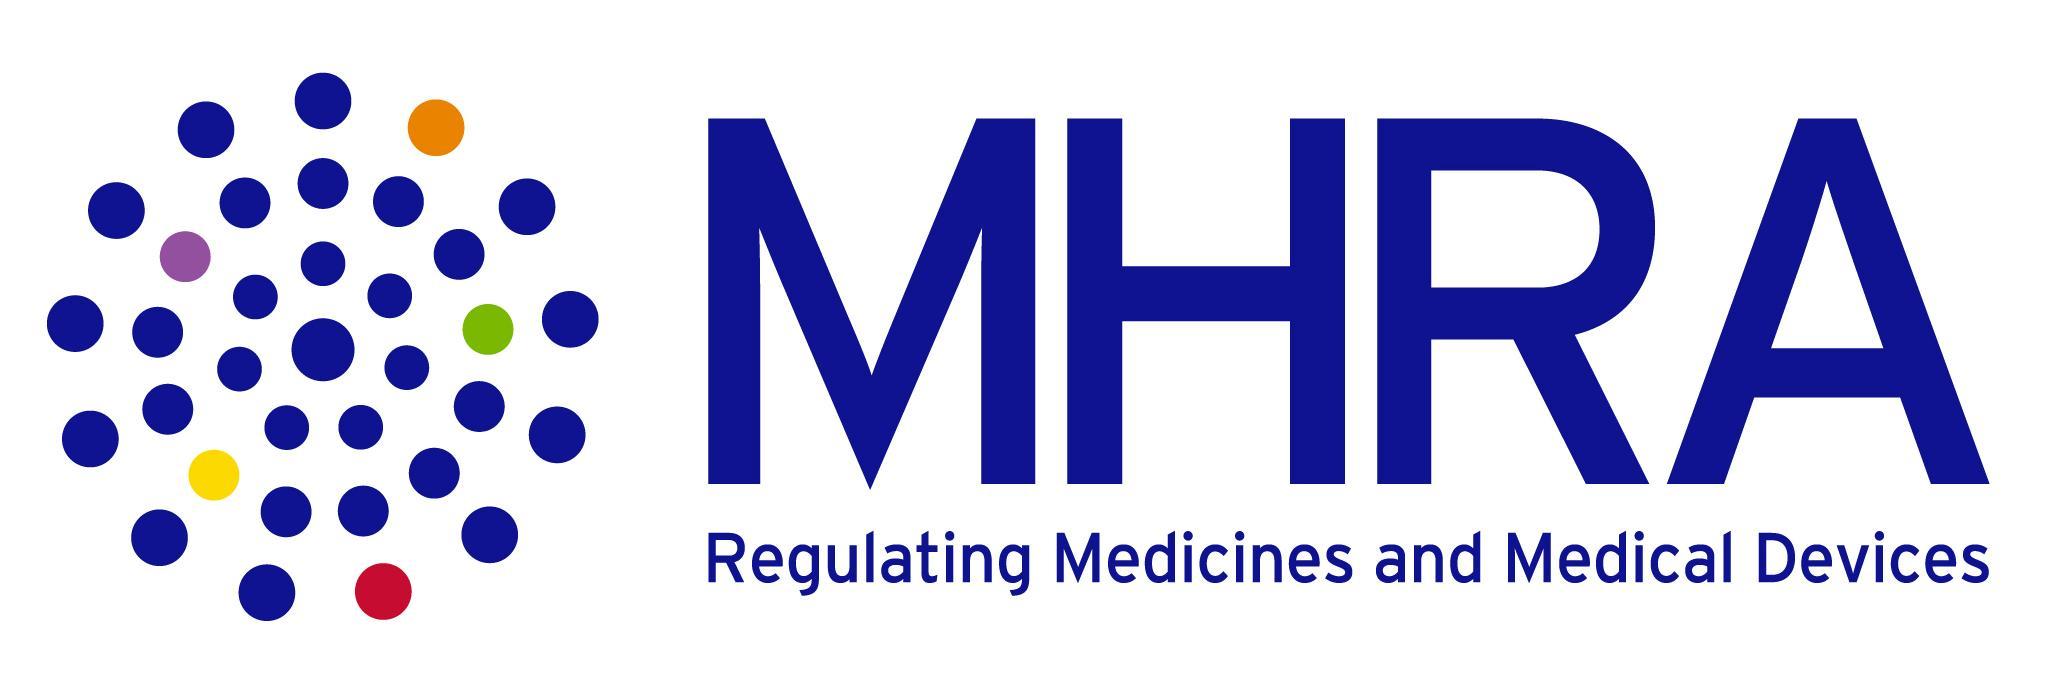 mhra_regulating_logo_strapline_rgb_screen